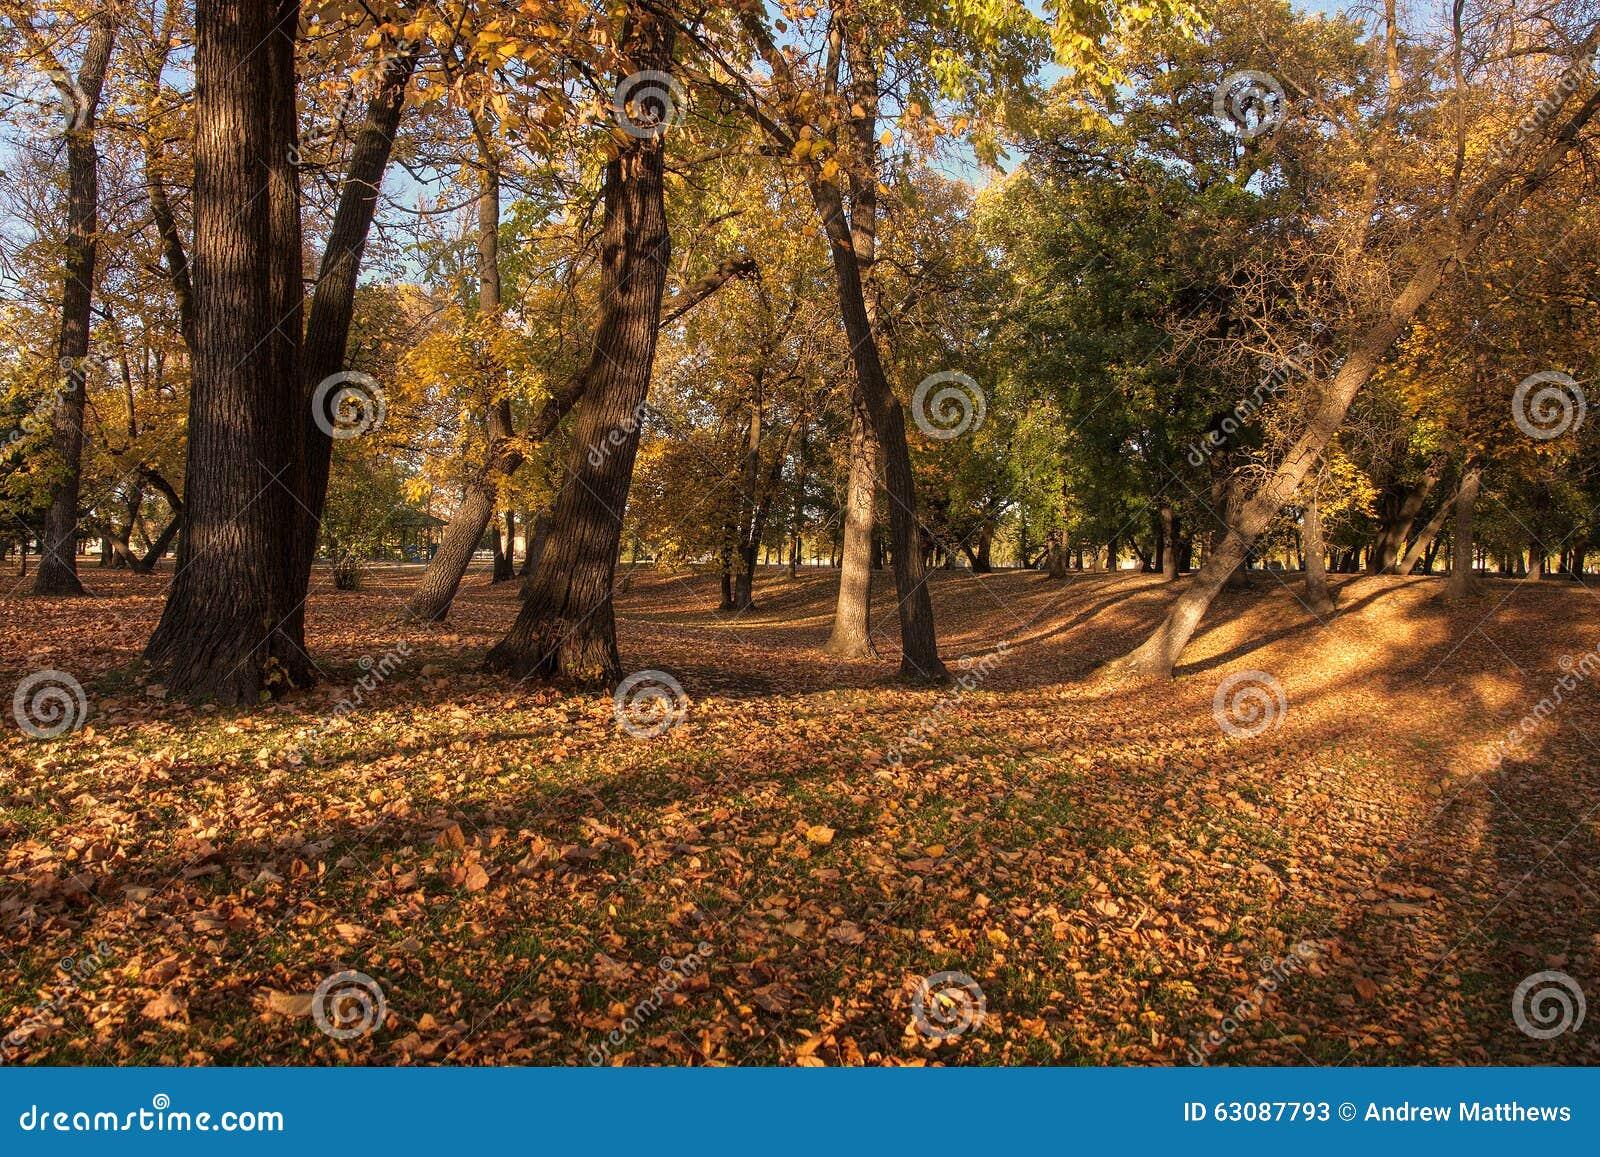 Download Autumn Leaves image stock. Image du course, stationnement - 63087793